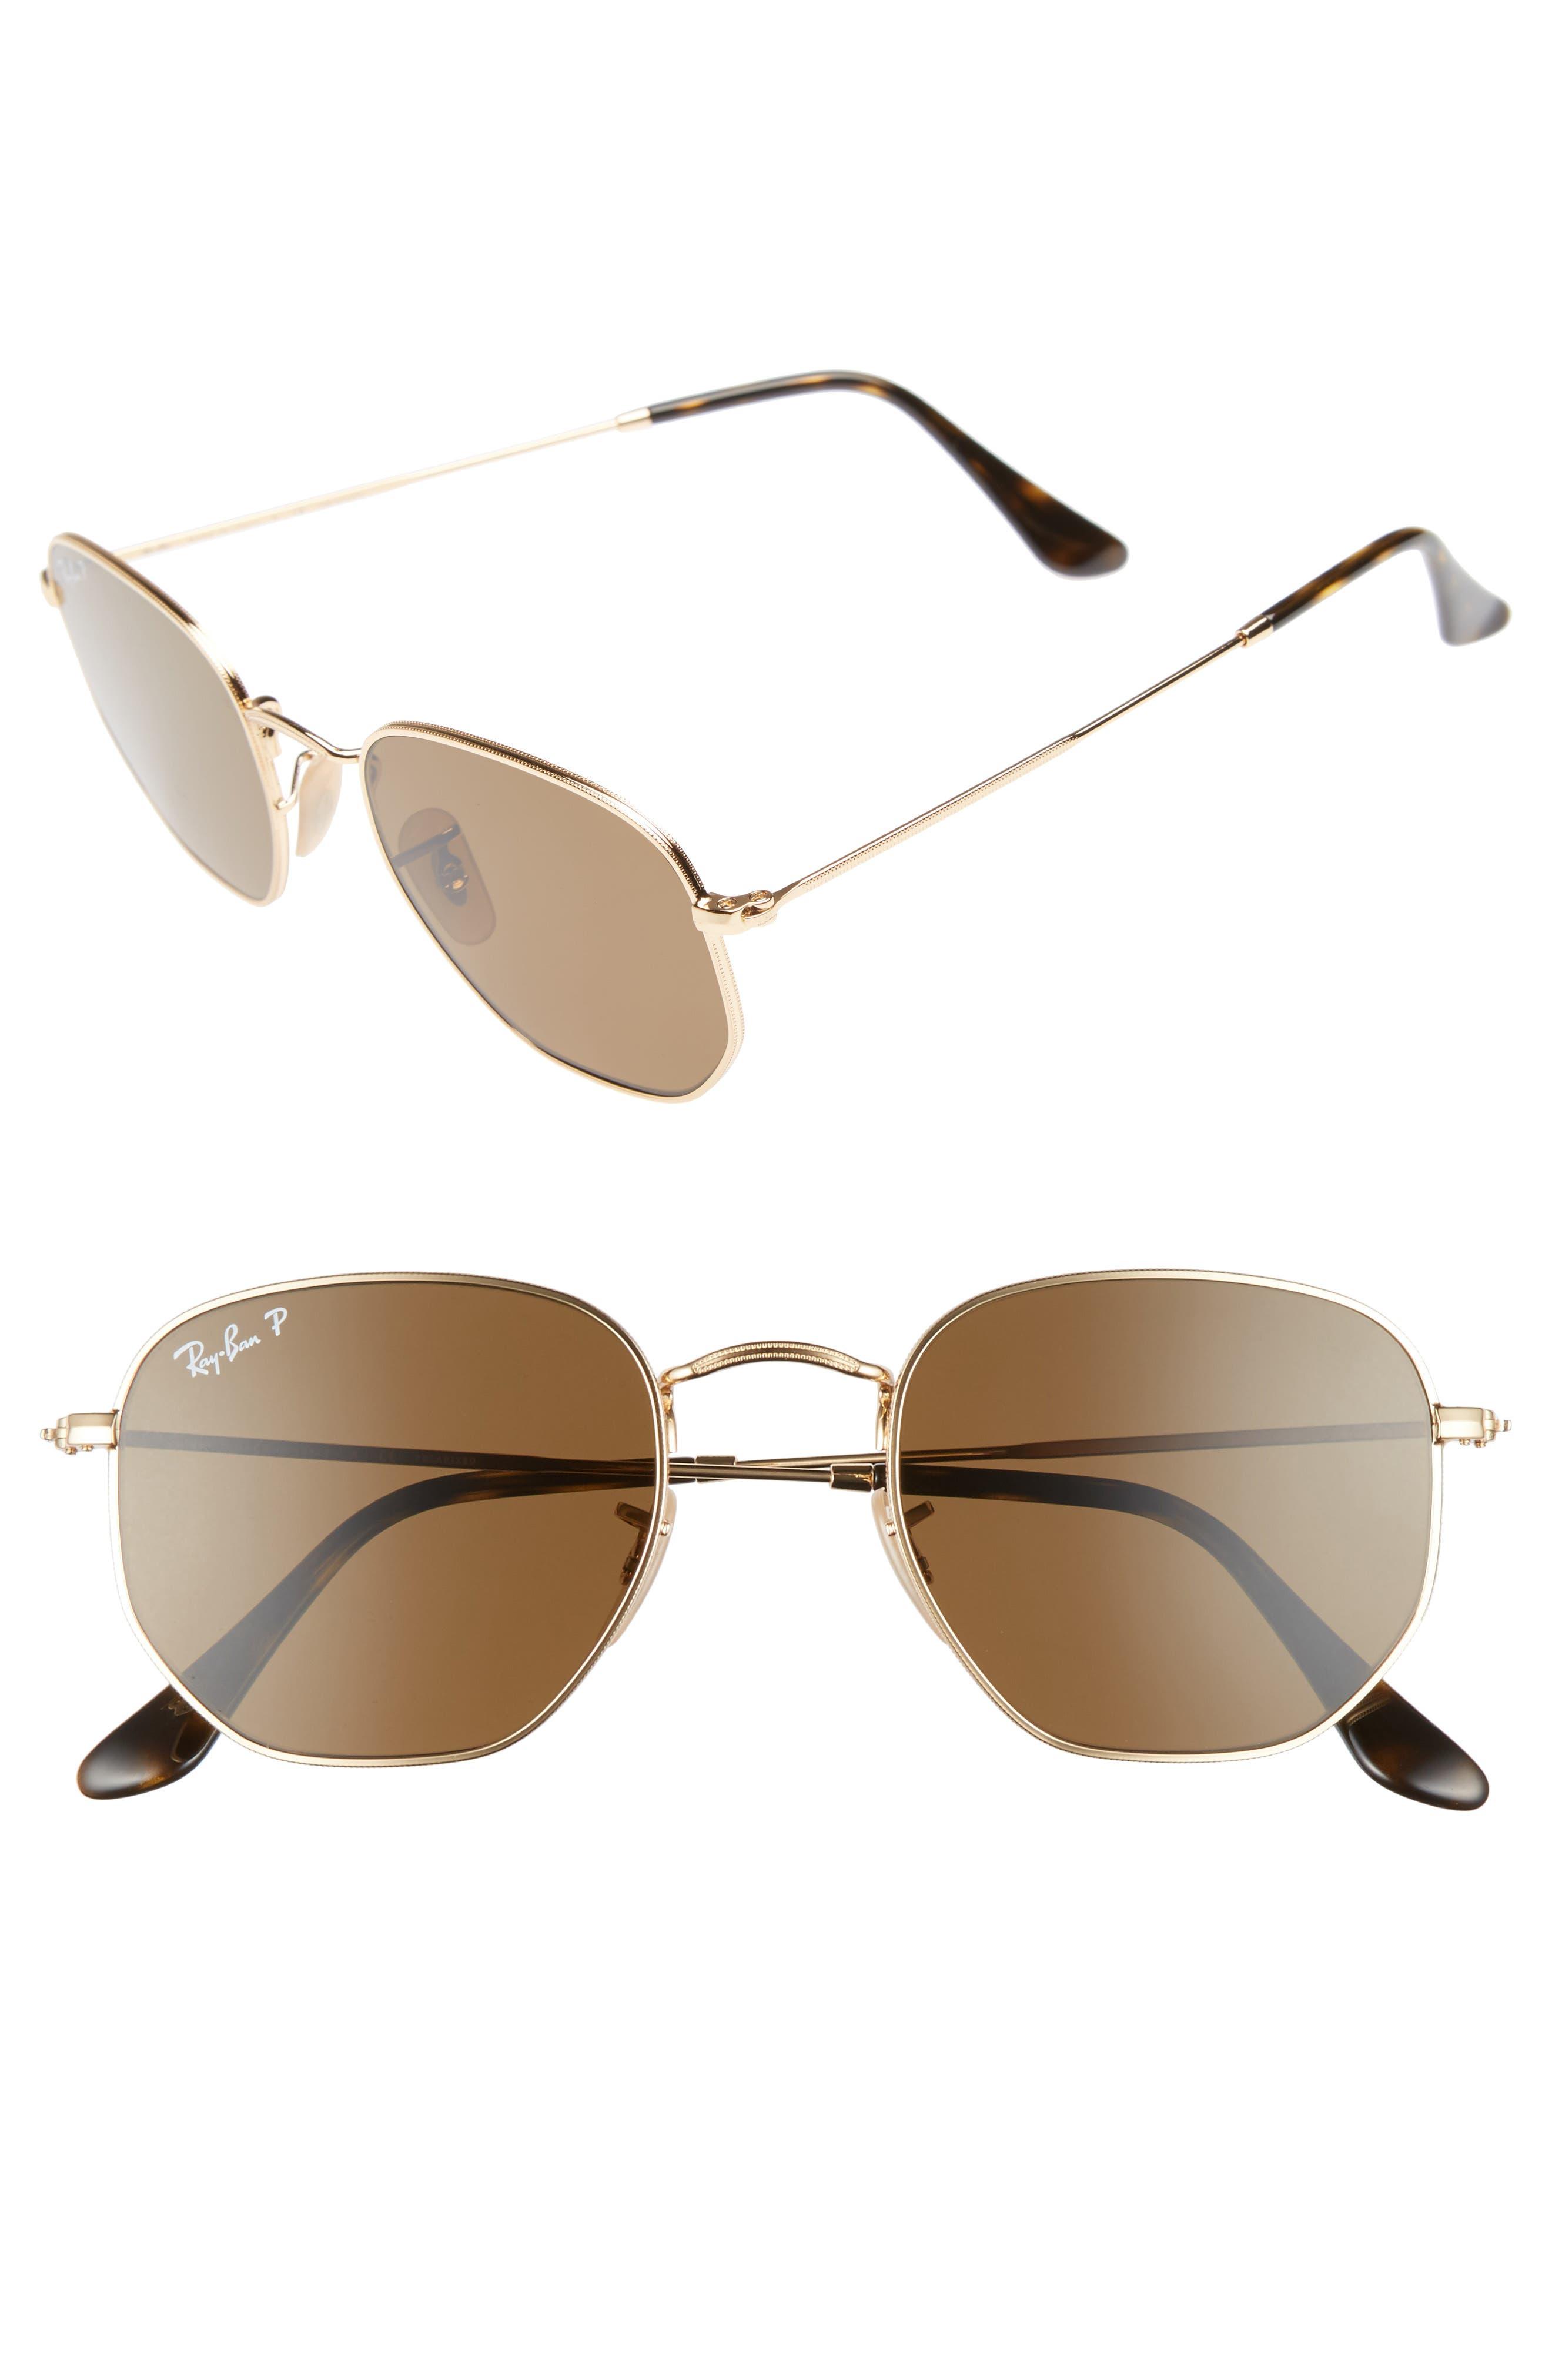 Ray-Ban 51mm Polarized Sunglasses